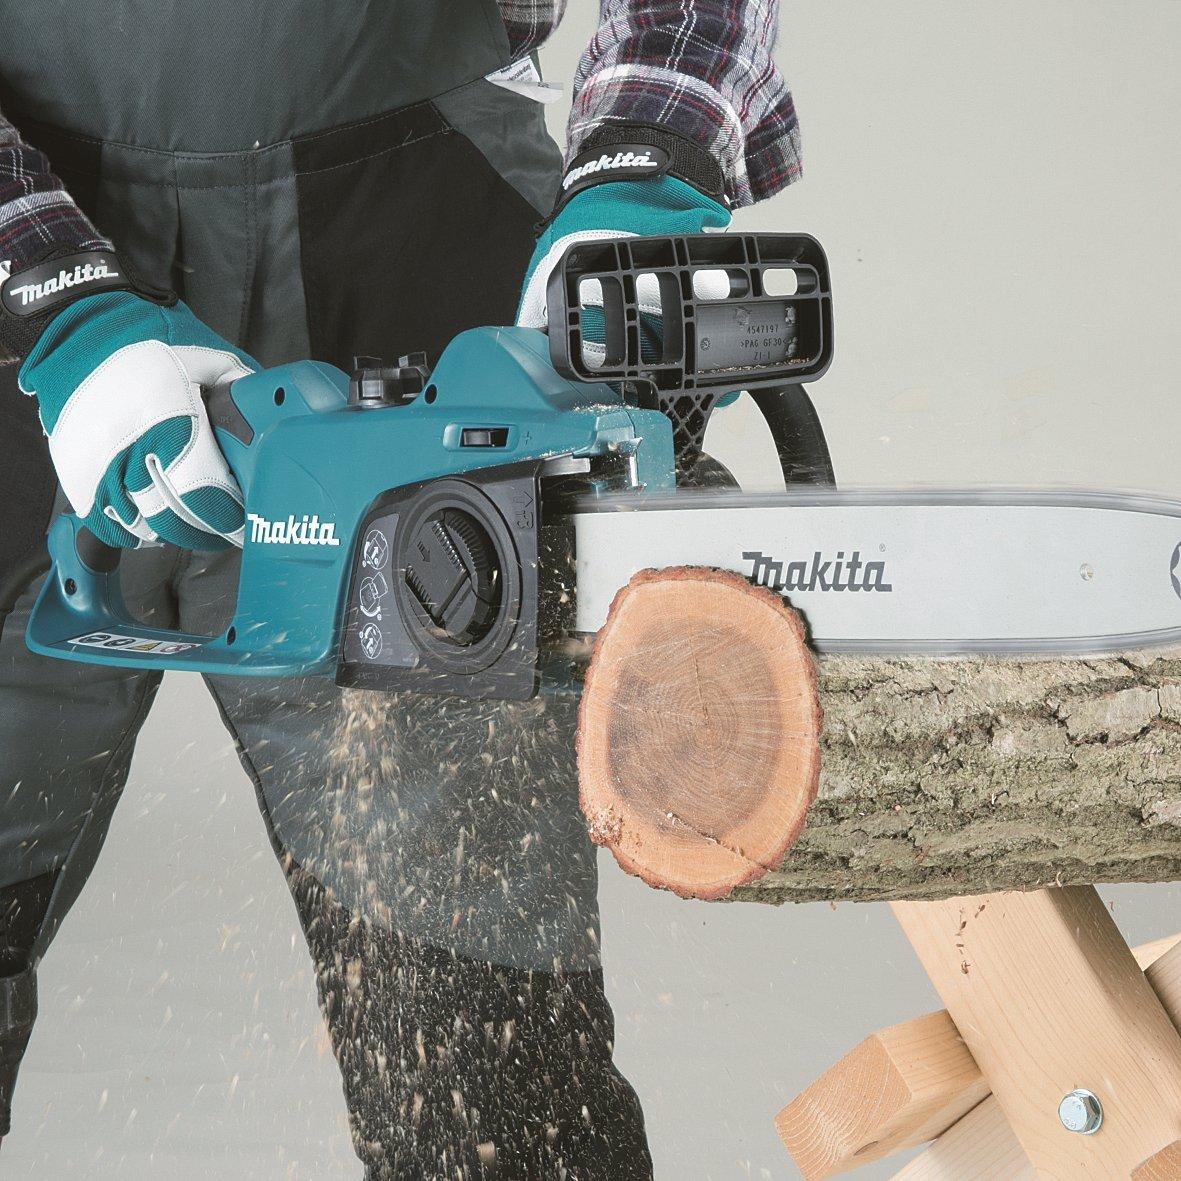 Makita uc3541a 240v electric chainsaw 35cm 1800w amazon diy makita uc3541a 240v electric chainsaw 35cm 1800w amazon diy tools greentooth Choice Image